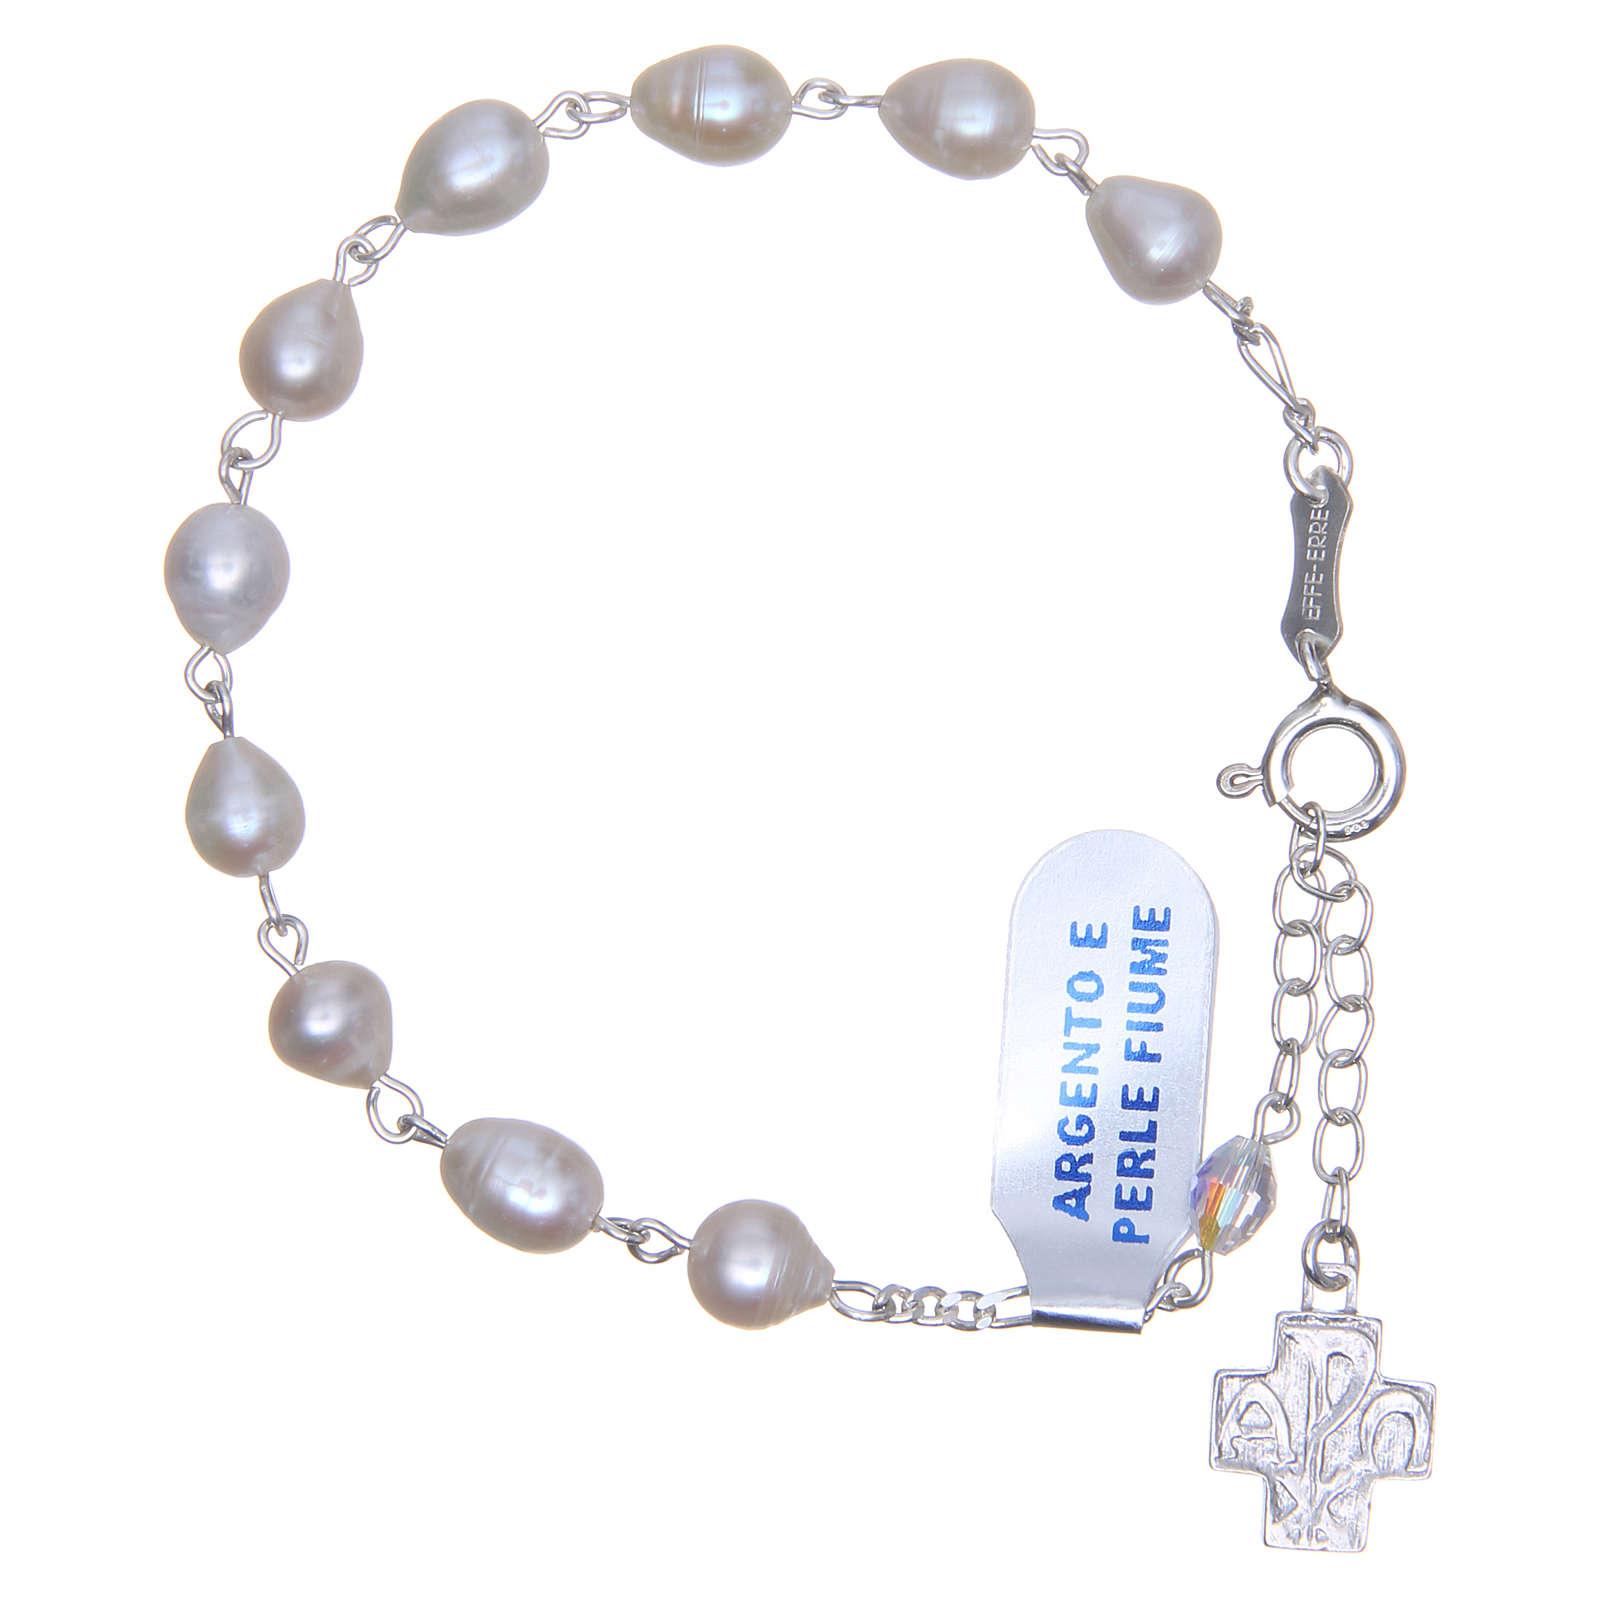 Bracciale perla fiume argento 800 6 mm croce pavè 4